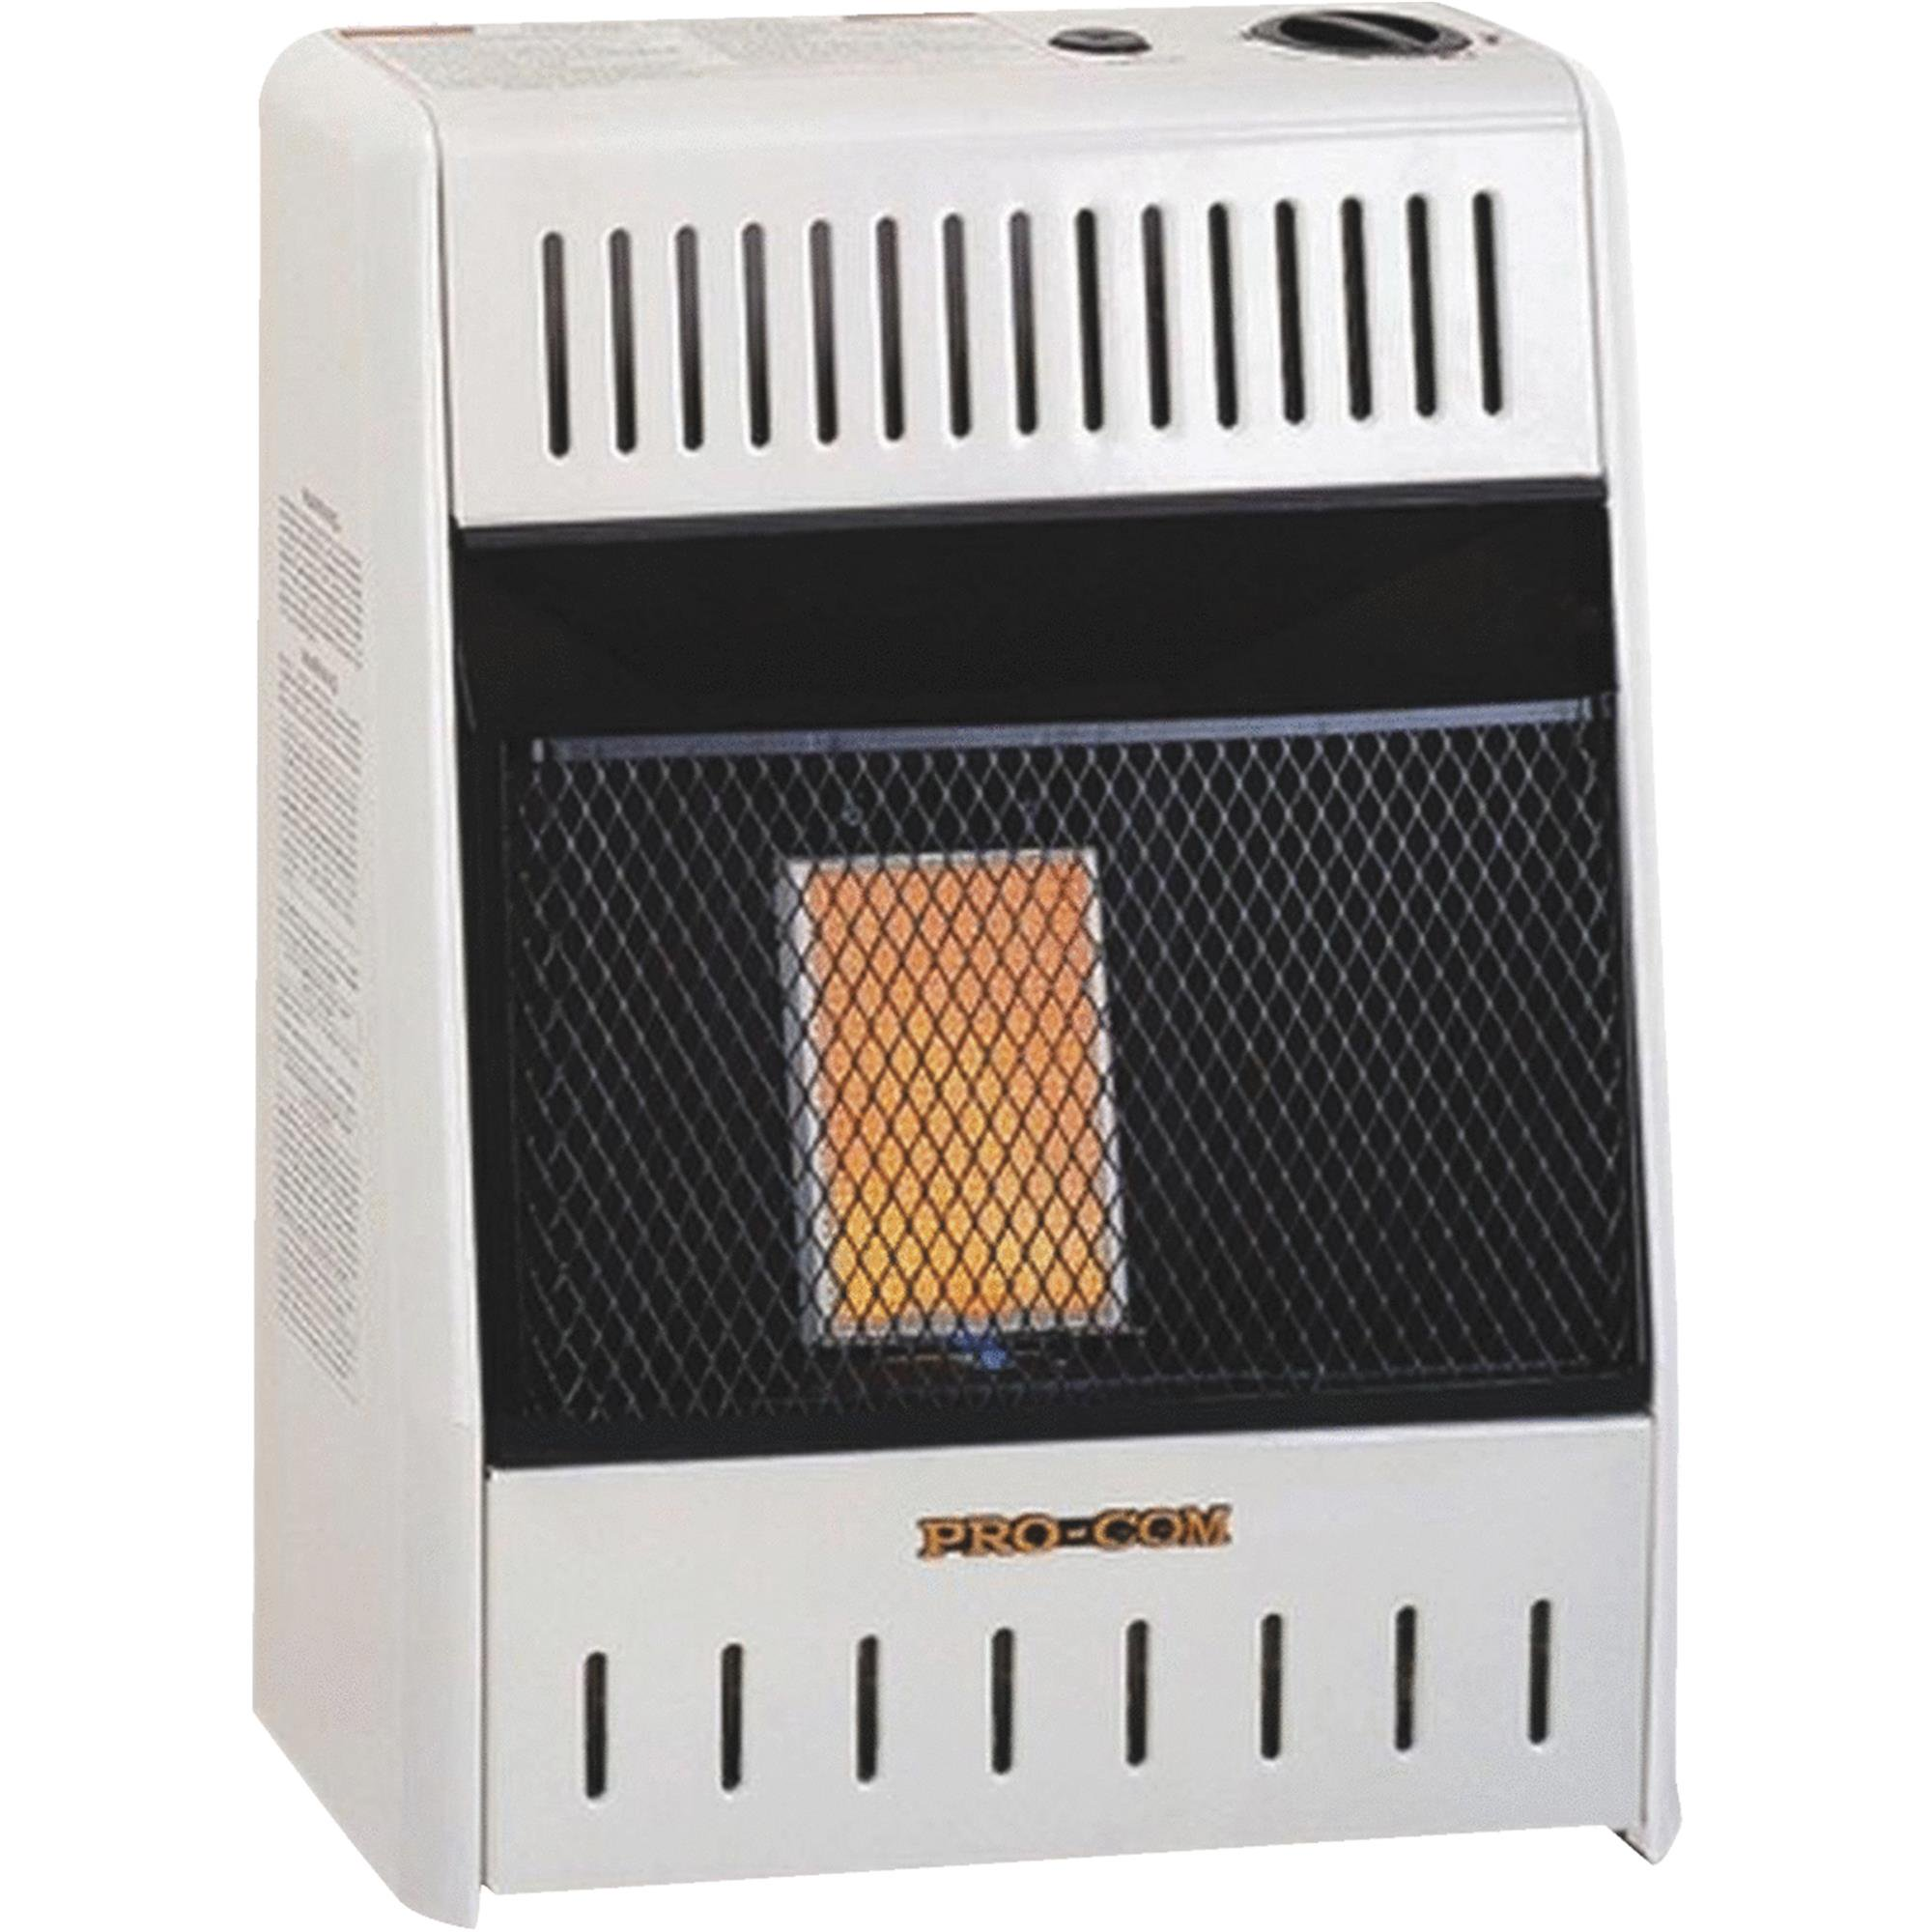 ProCom Infrared Gas Wall Heater by PROCOM HEATING INC